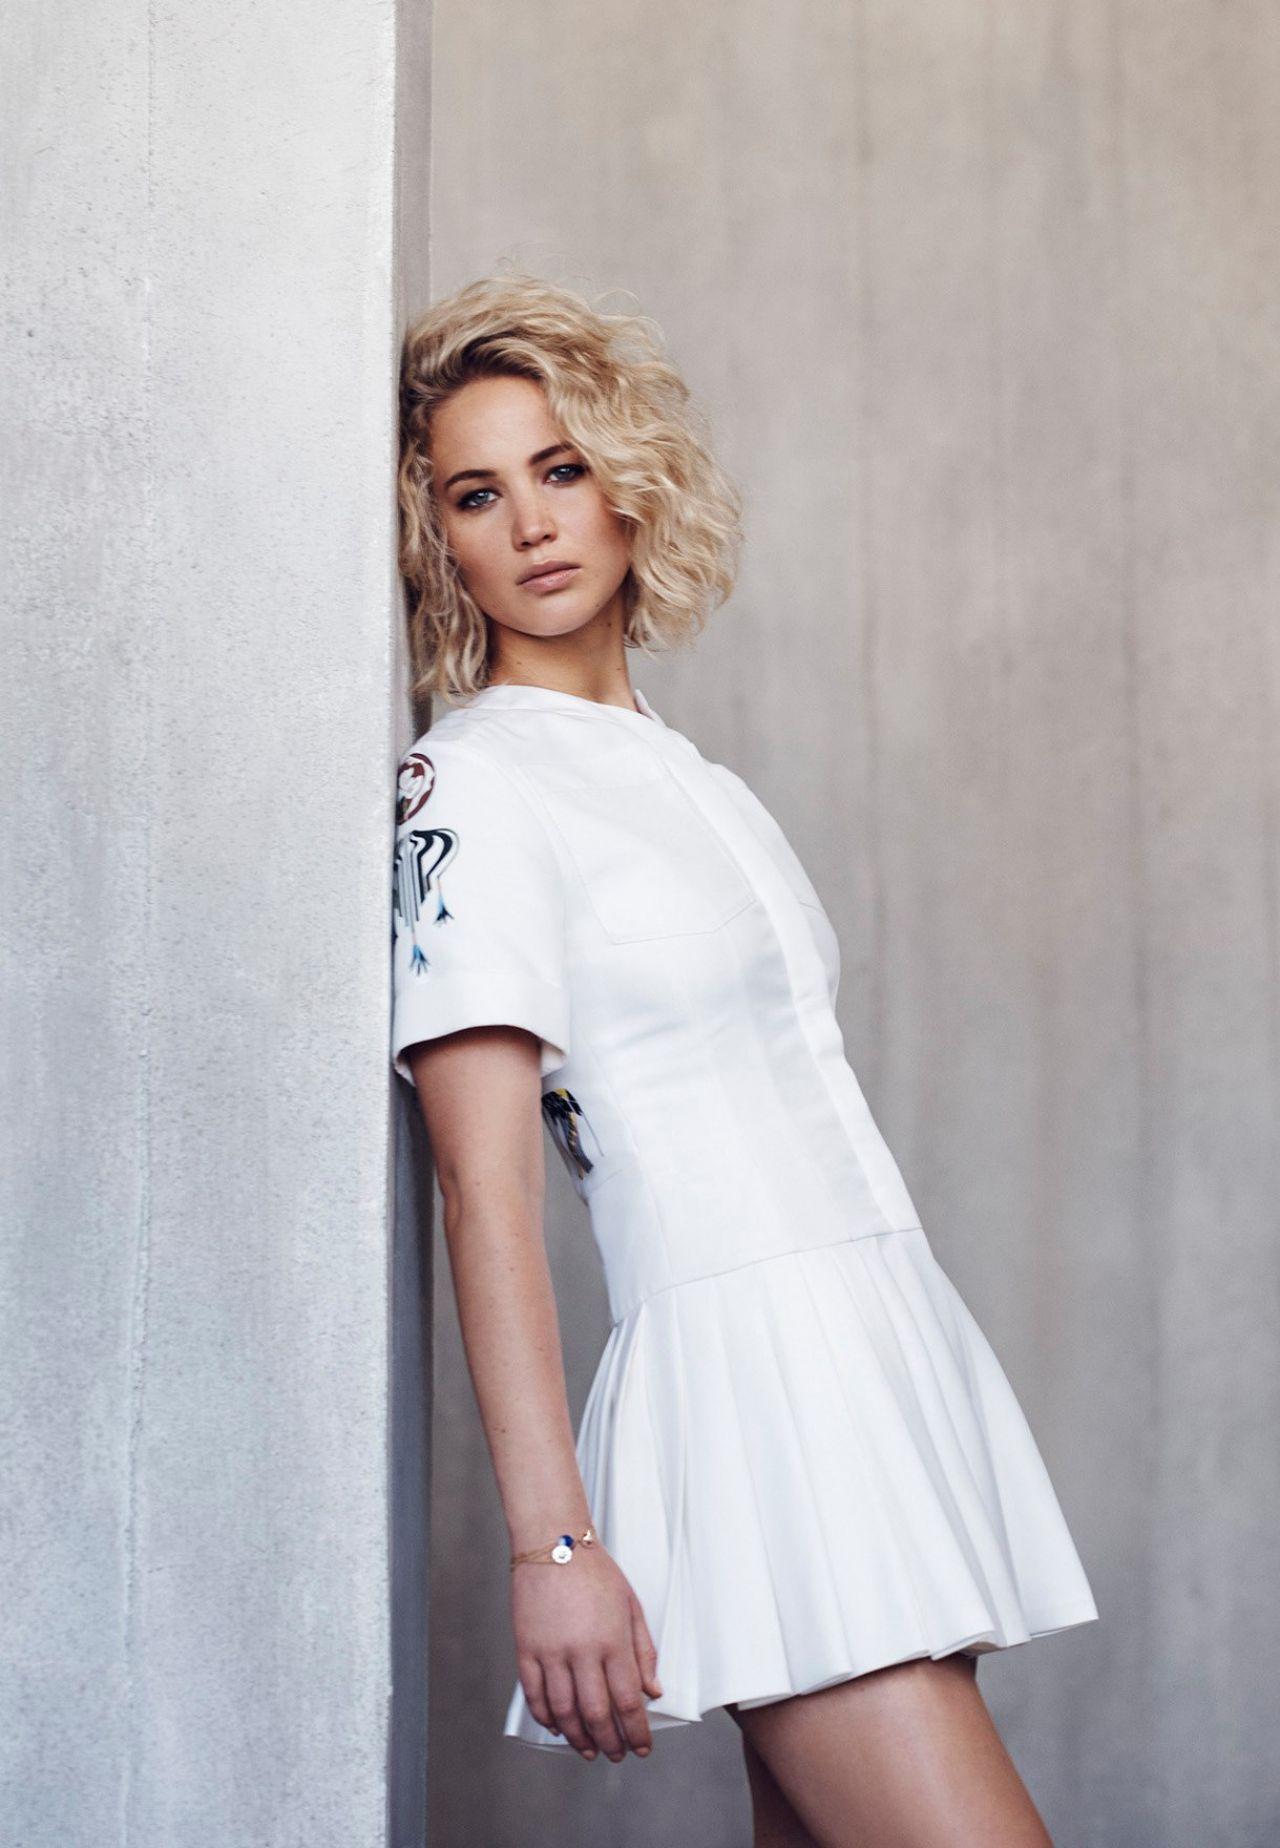 Jennifer Lawrence Photo Shoot For Dior 2016